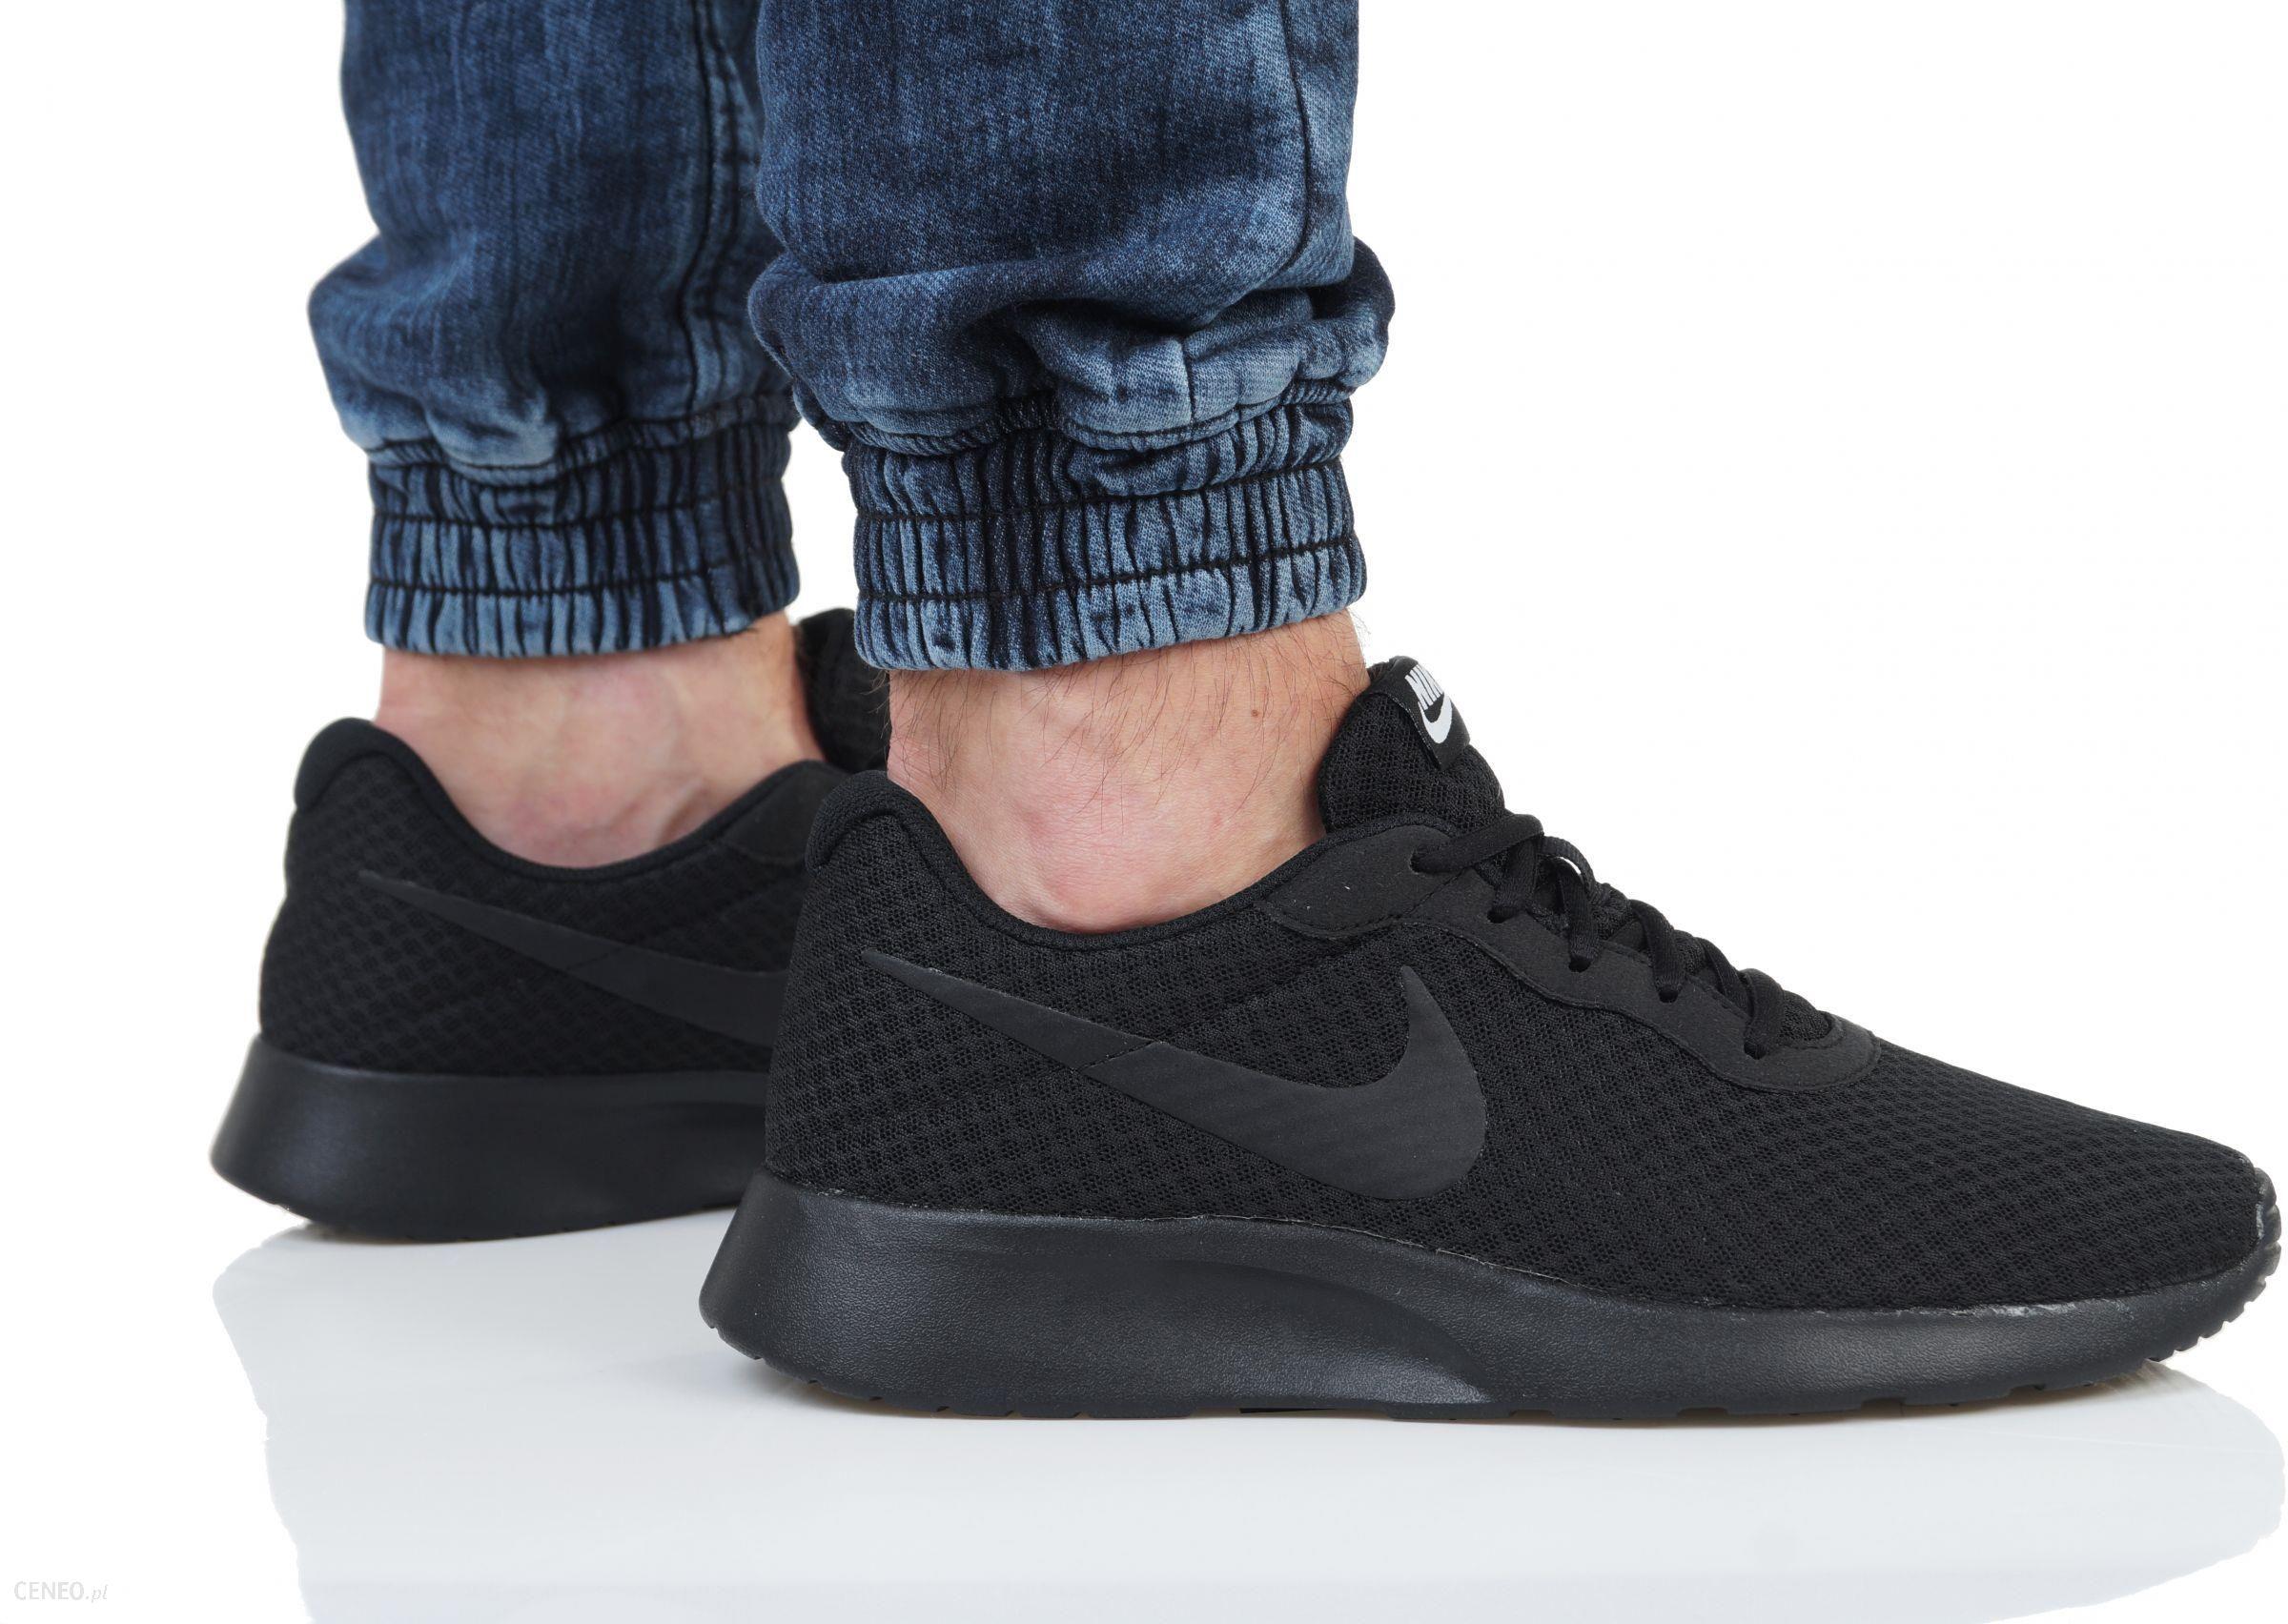 NIKE TANJUN kolor CZARNY (812655 002) Damskie Sneakersy